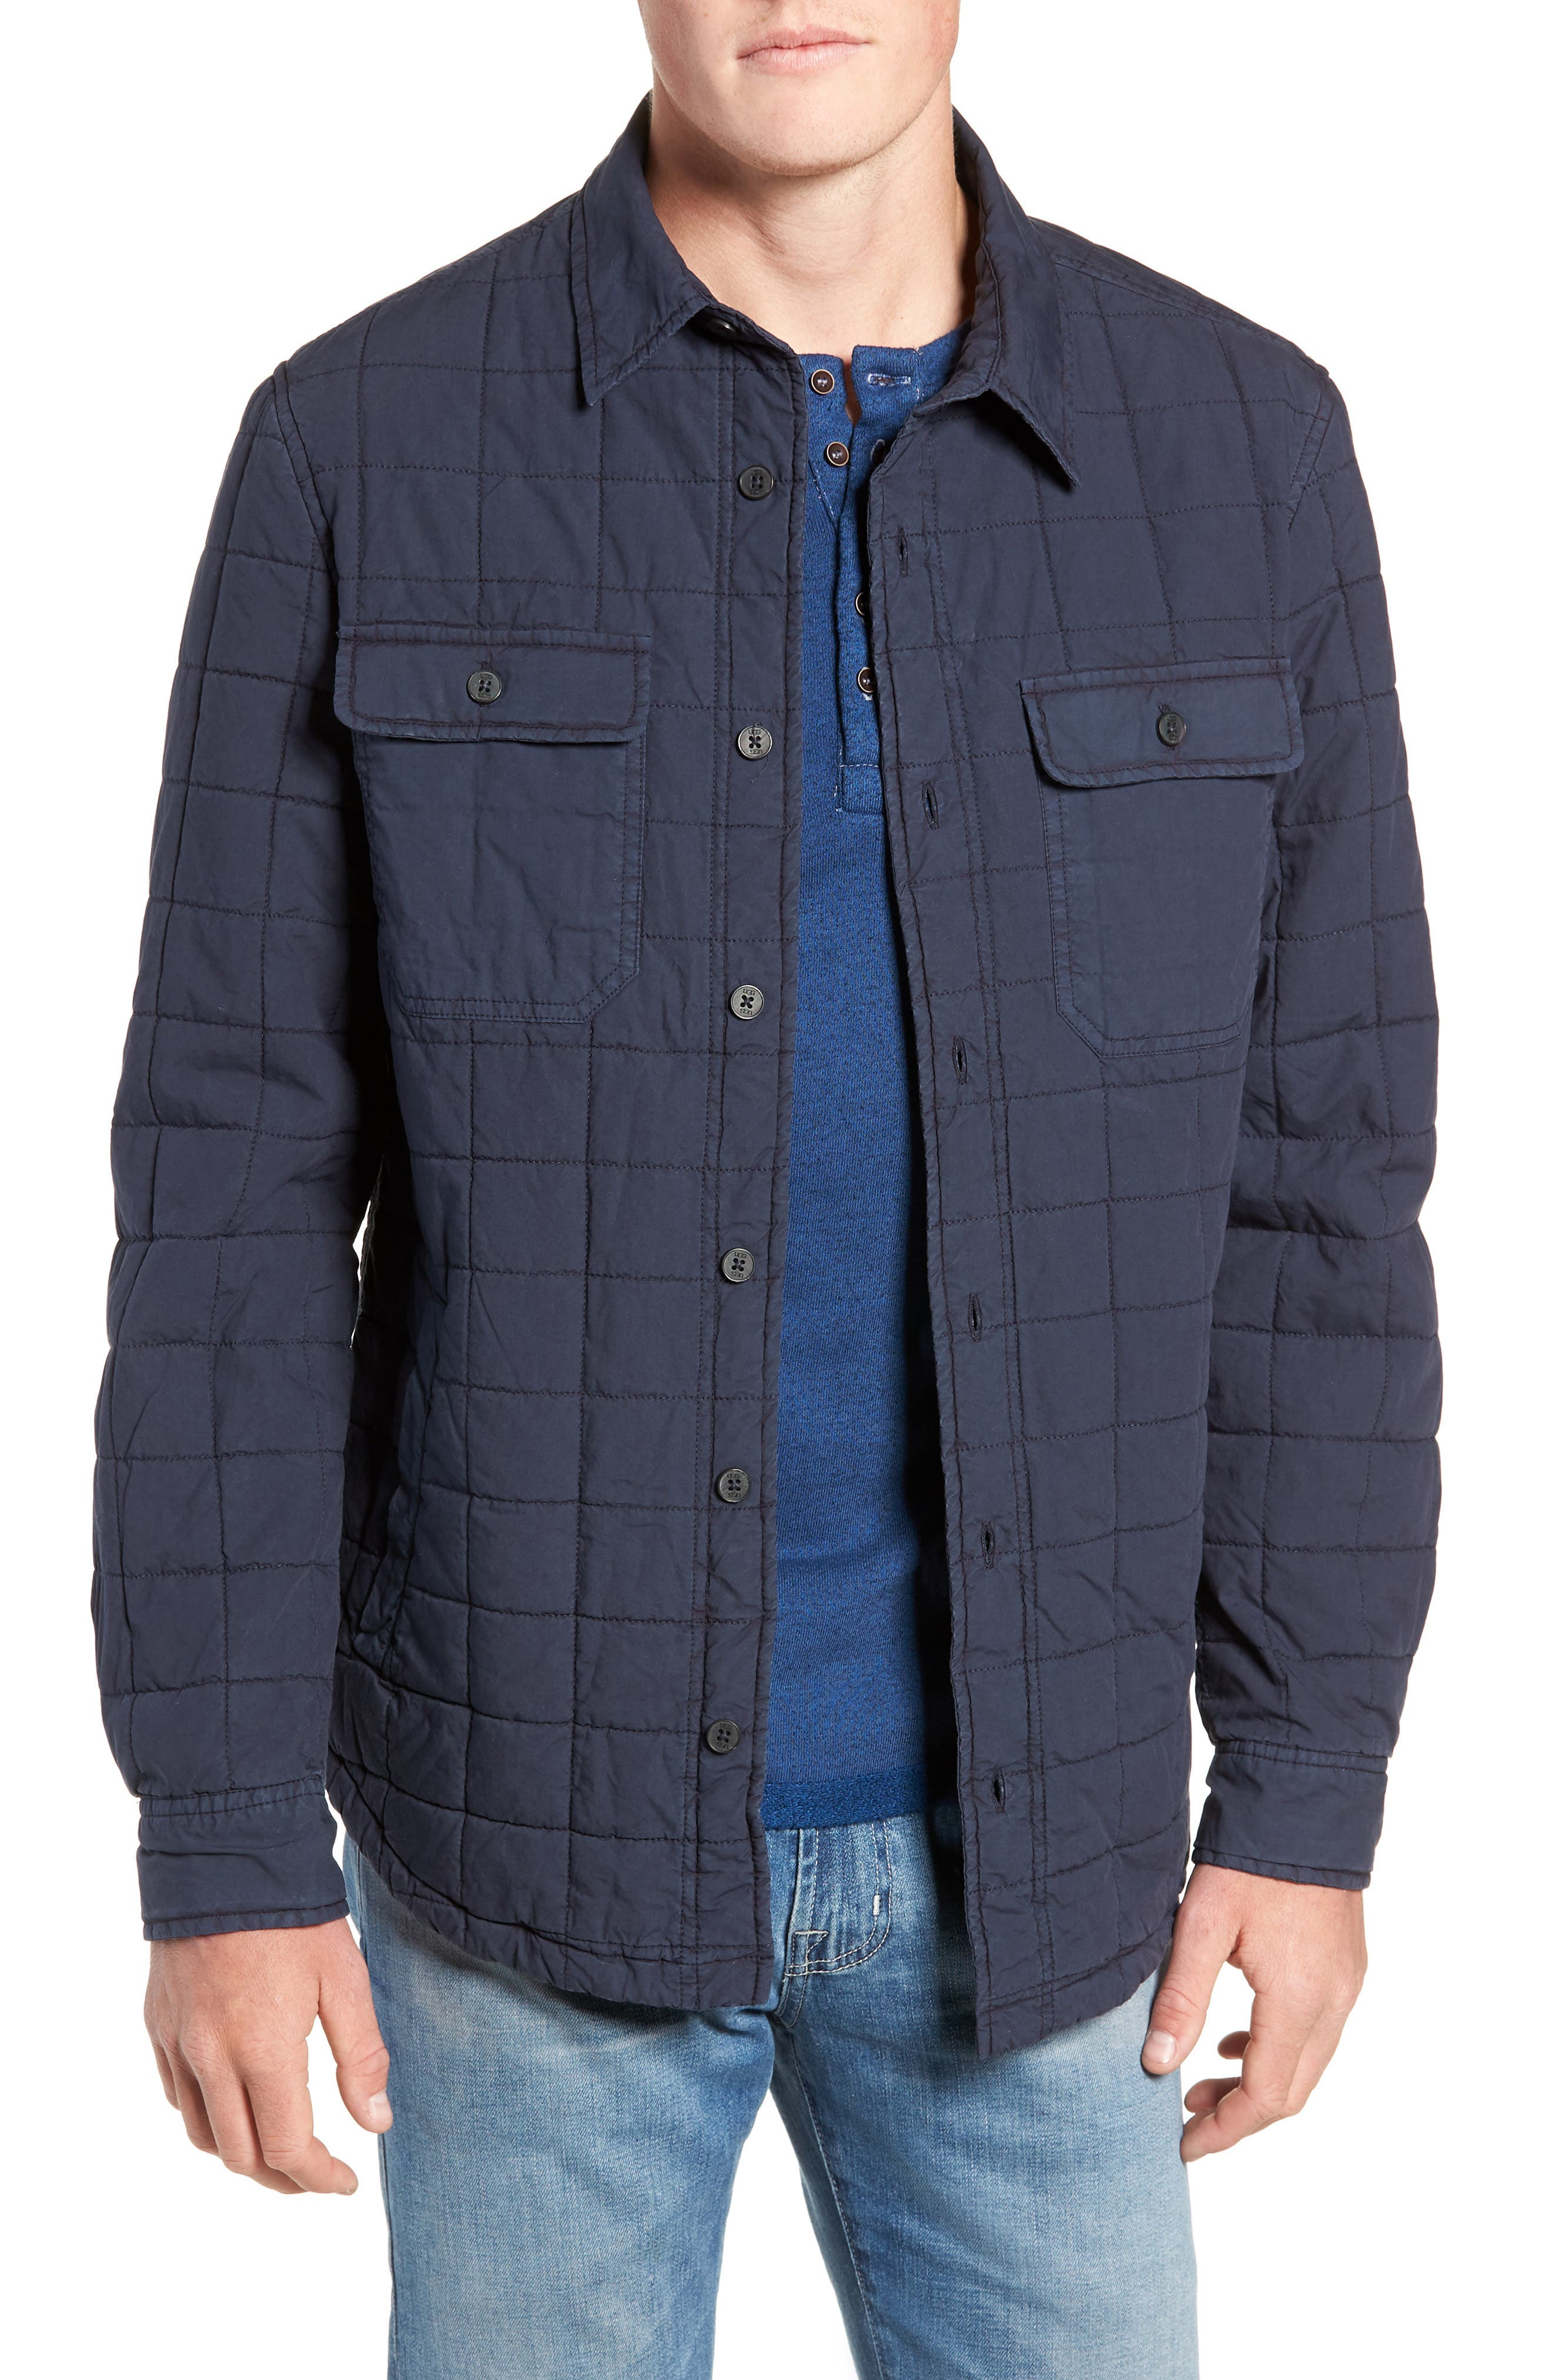 UGG<SUP>®</SUP>, Quilted Shirt Jacket, Main thumbnail 1, color, 400